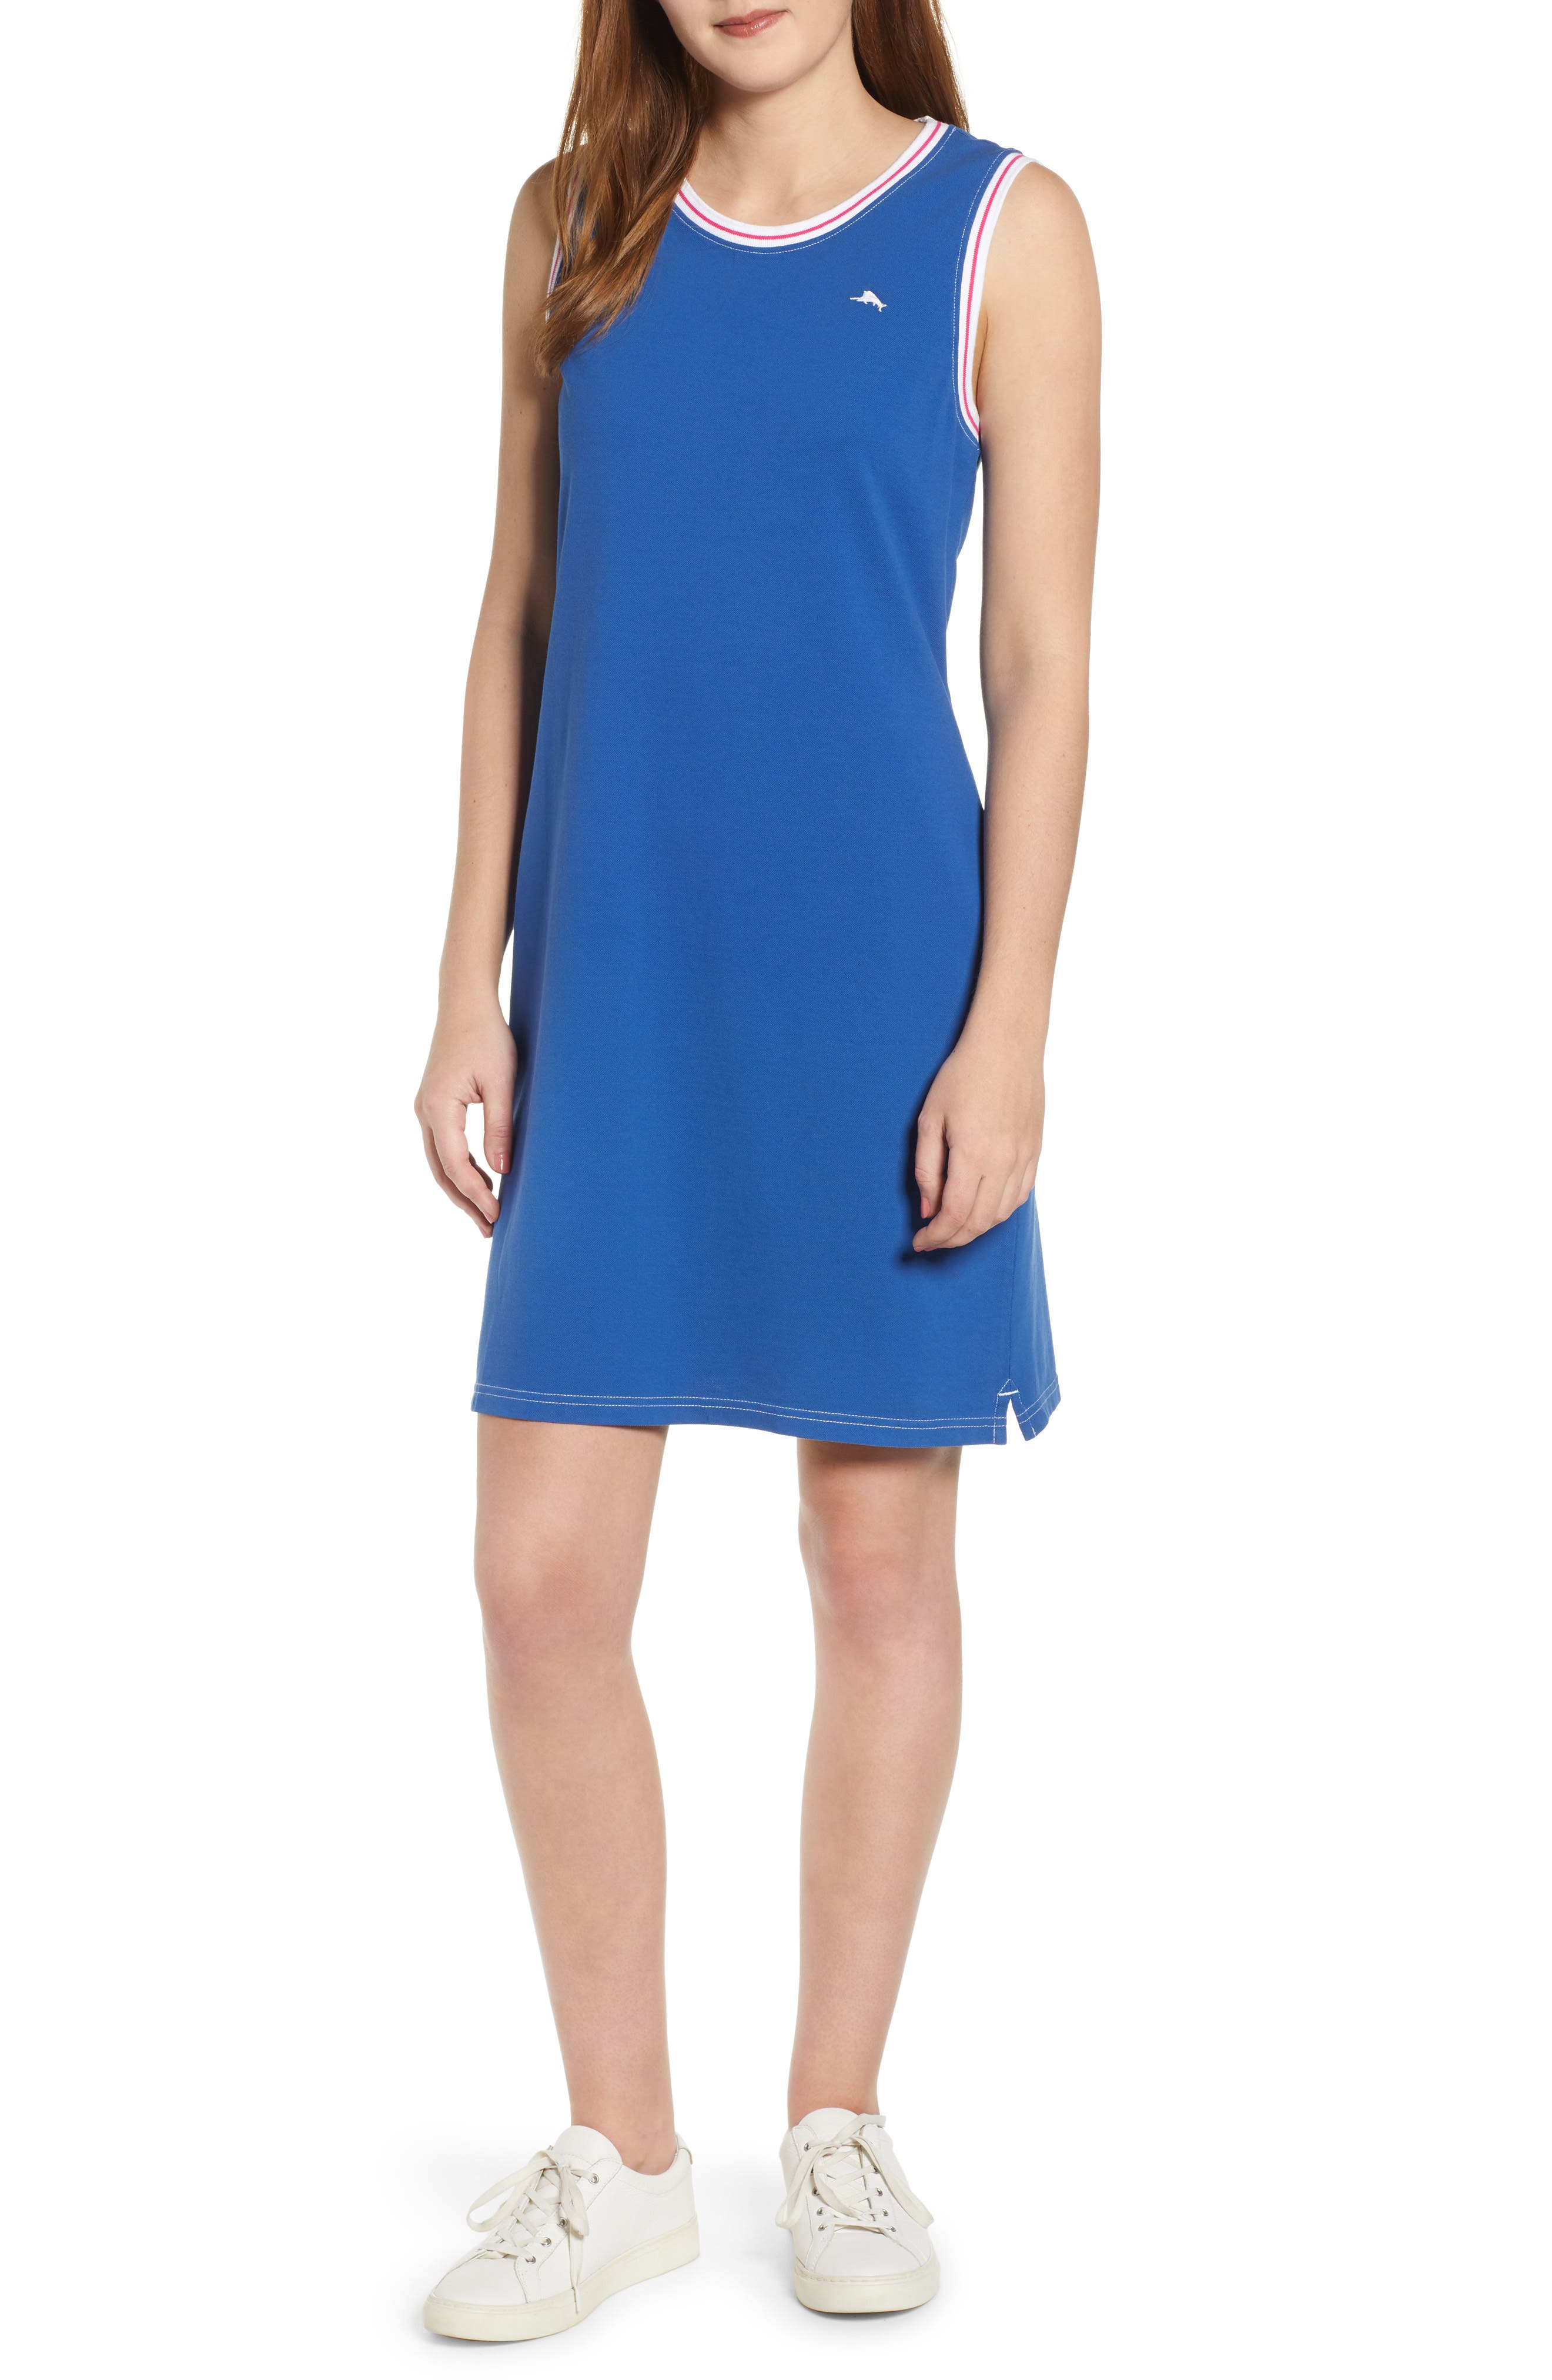 Tommy Bahama Paradise Classic Sleeveless Dress, Blue